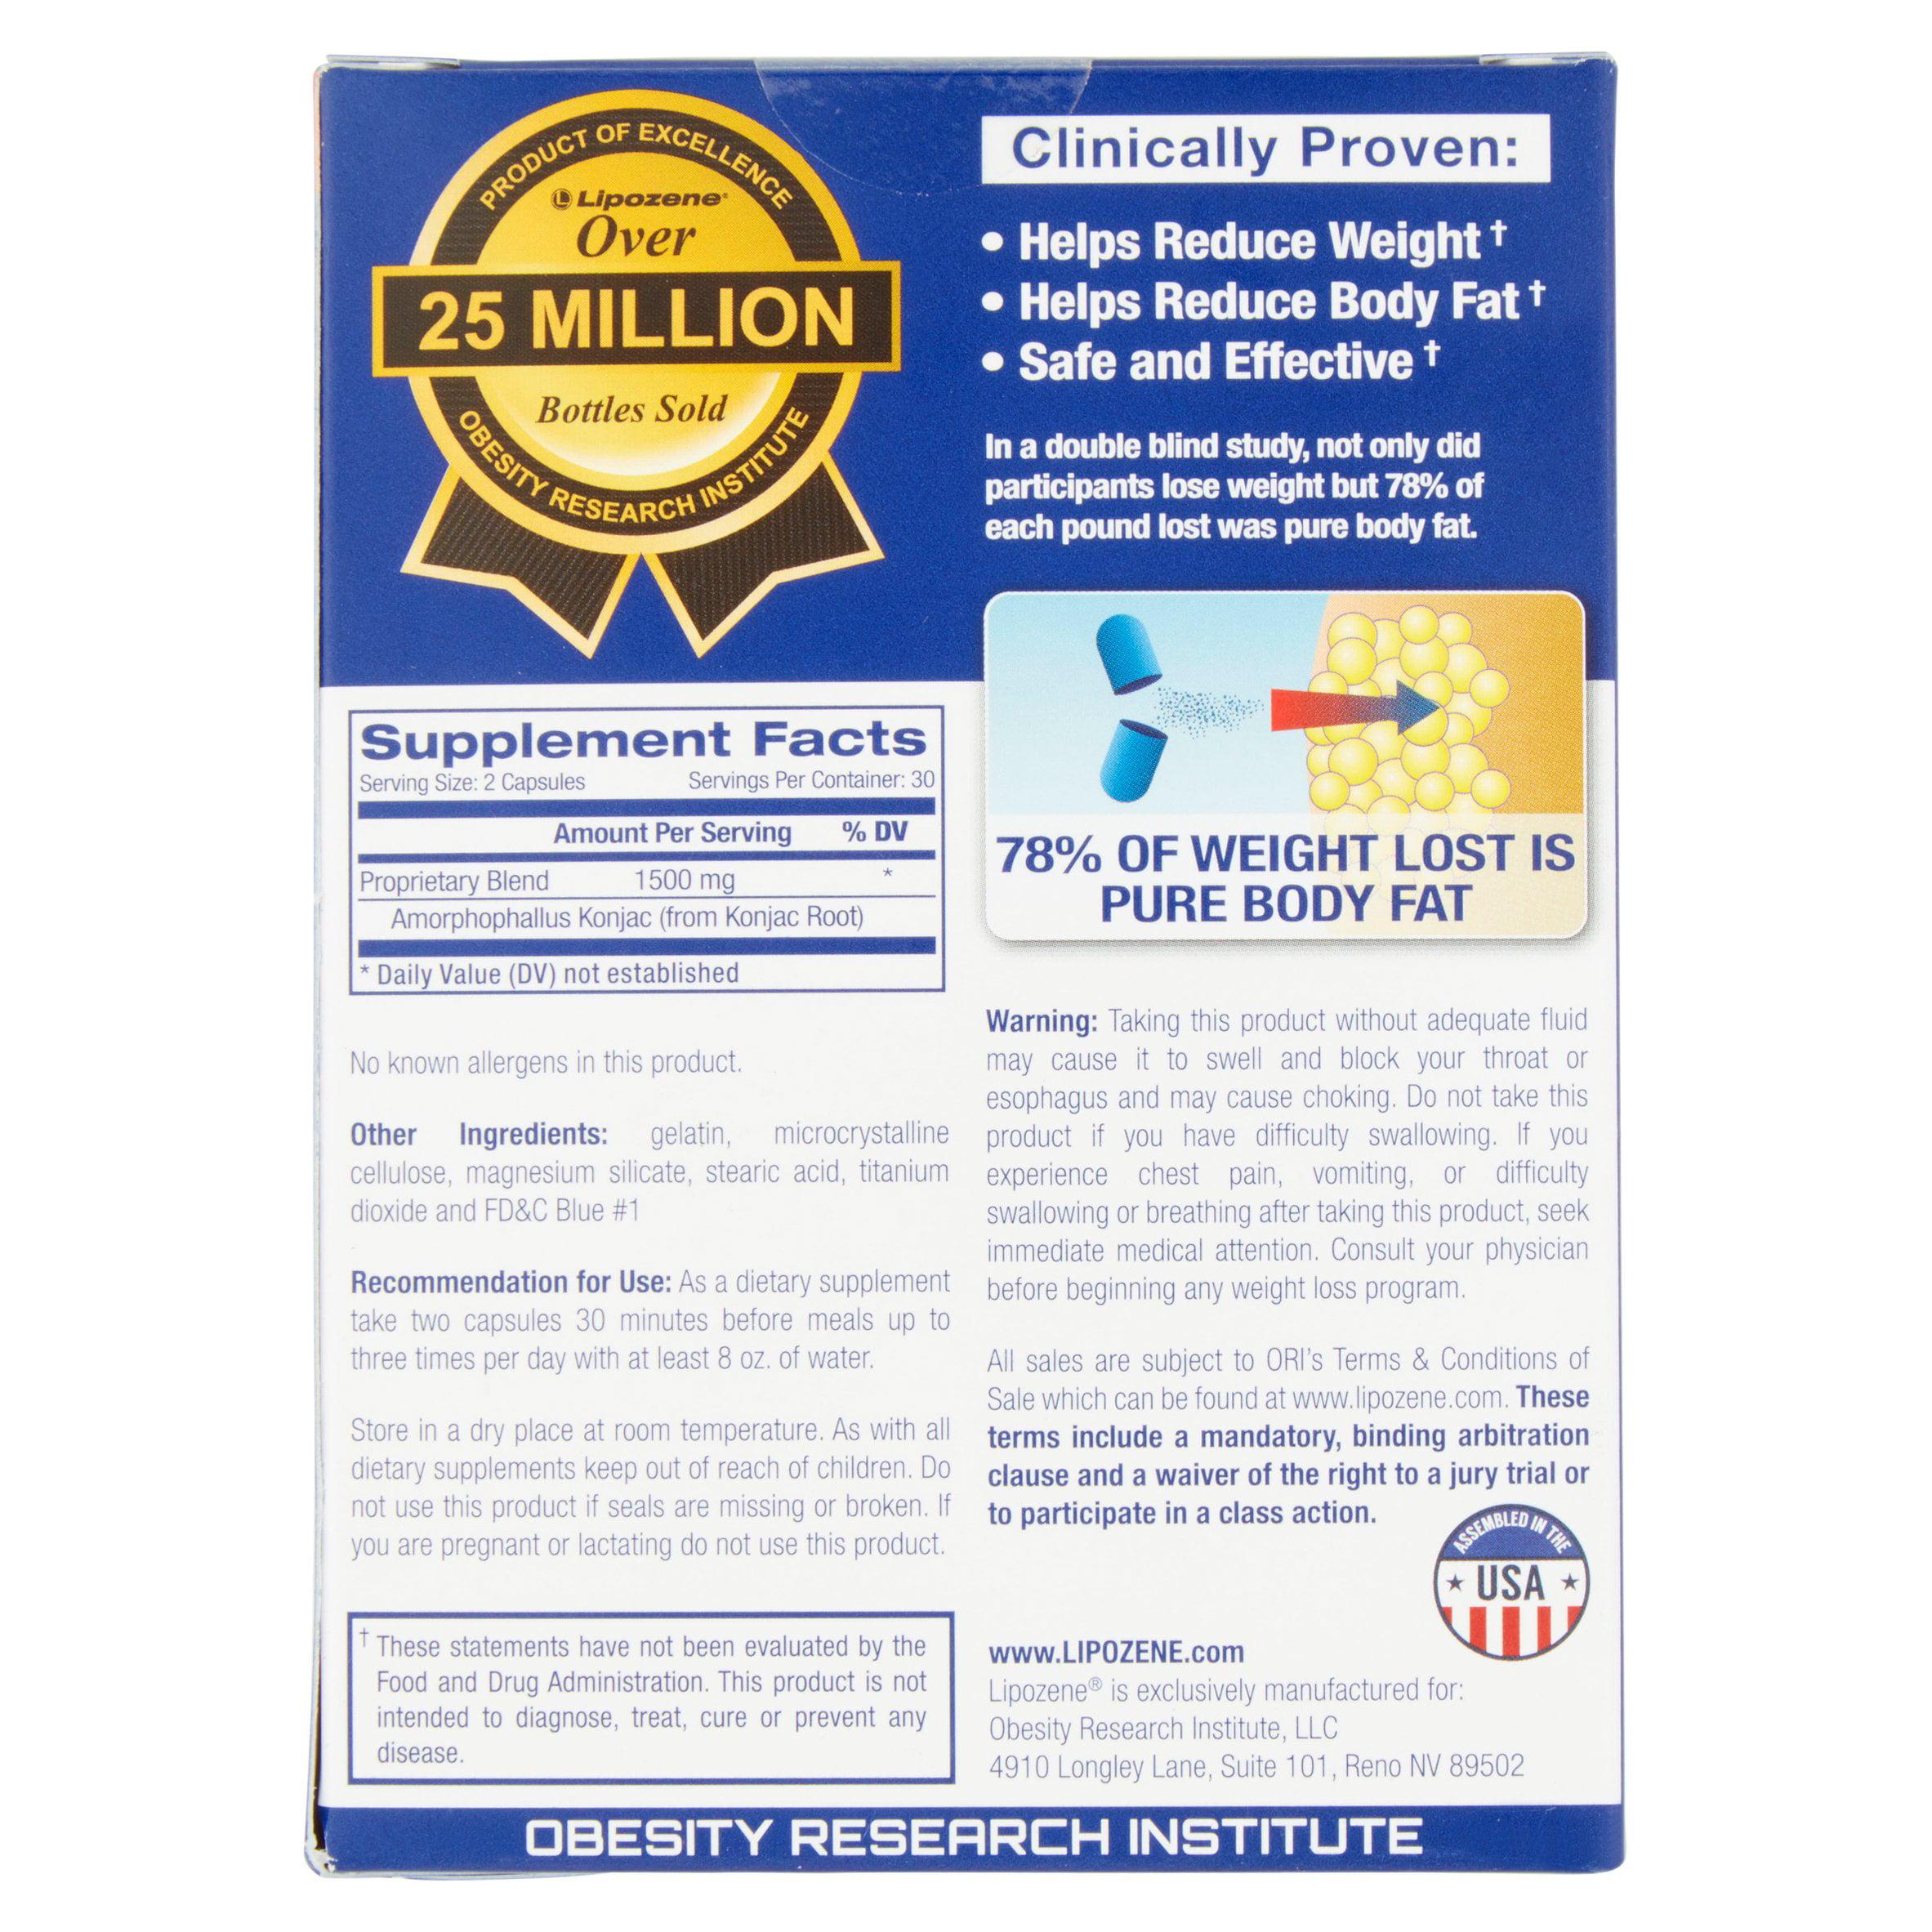 Ultimate fat loss nj cost per pound - Lipozene Amorphophallus Konjac Maximum Strength Capsules Bonus Pack 60 Count Walmart Com